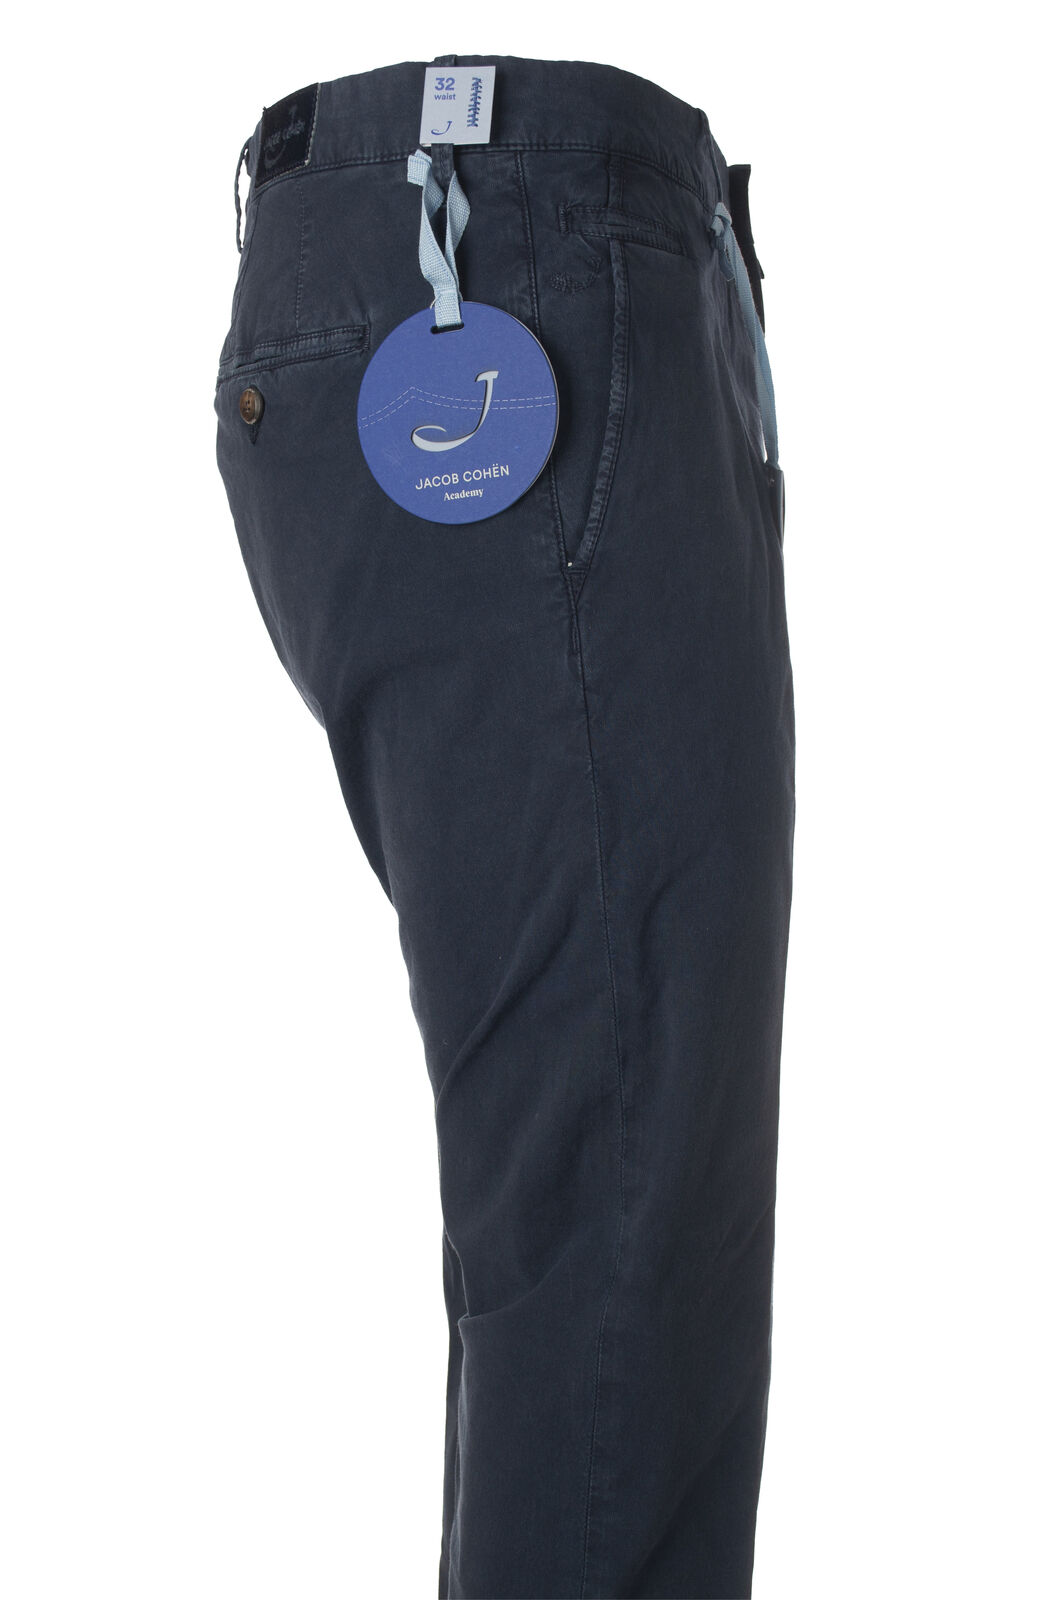 Jacob Cohen - Pants-Pants - Man - bluee - 5980012C190729